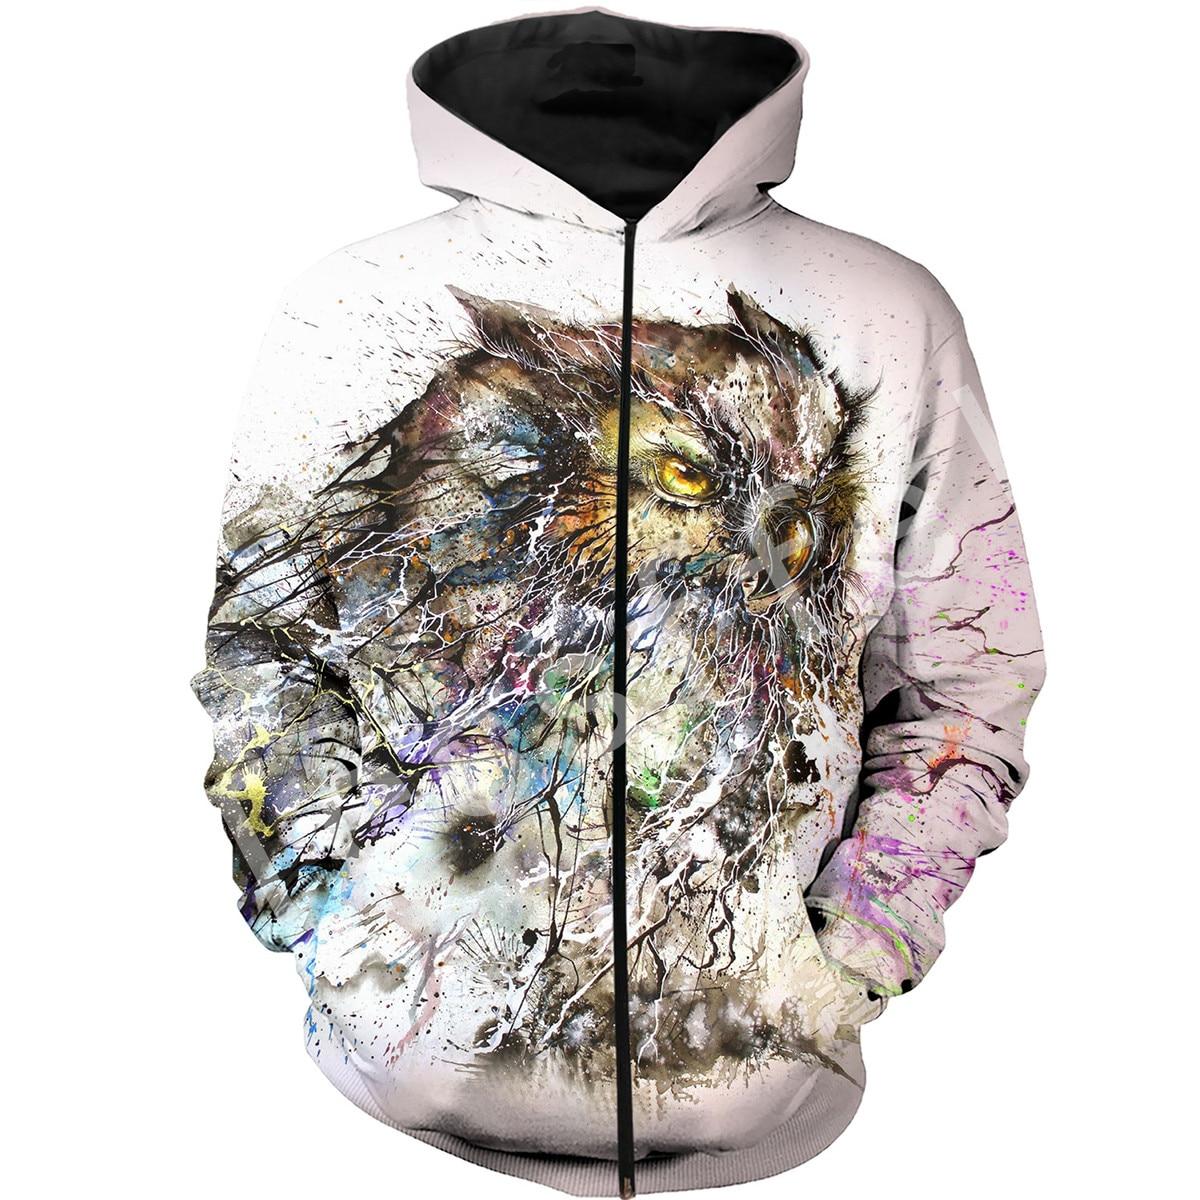 Tessffel Animal owl Harajuku MenWomen HipHop 3Dfull Printed Sweatshirts Hoodie shirts Jacket Casual fit colorful camo Style 1 in Hoodies amp Sweatshirts from Men 39 s Clothing